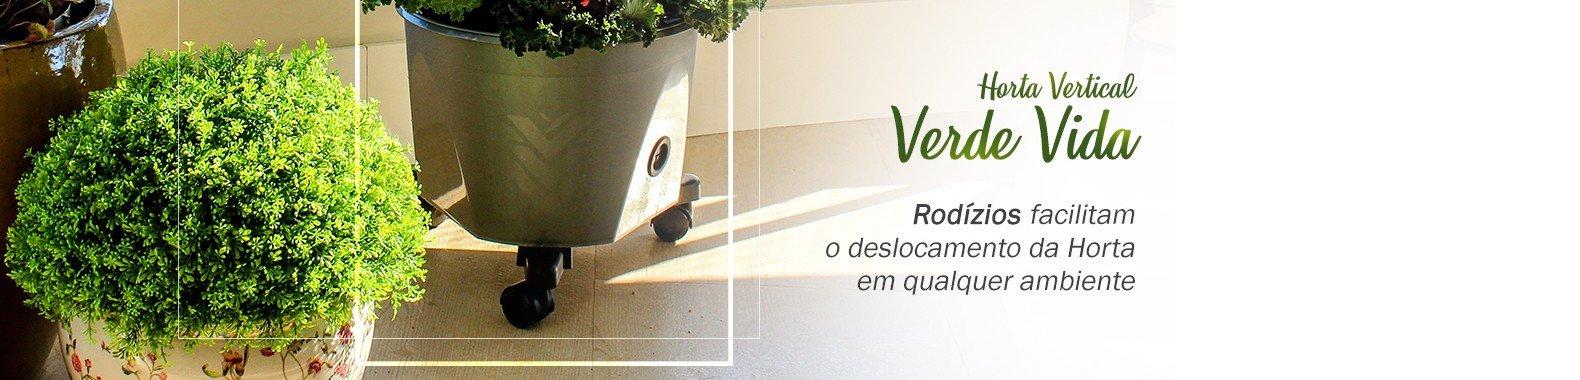 banner-horta-verde-vida-rodizio